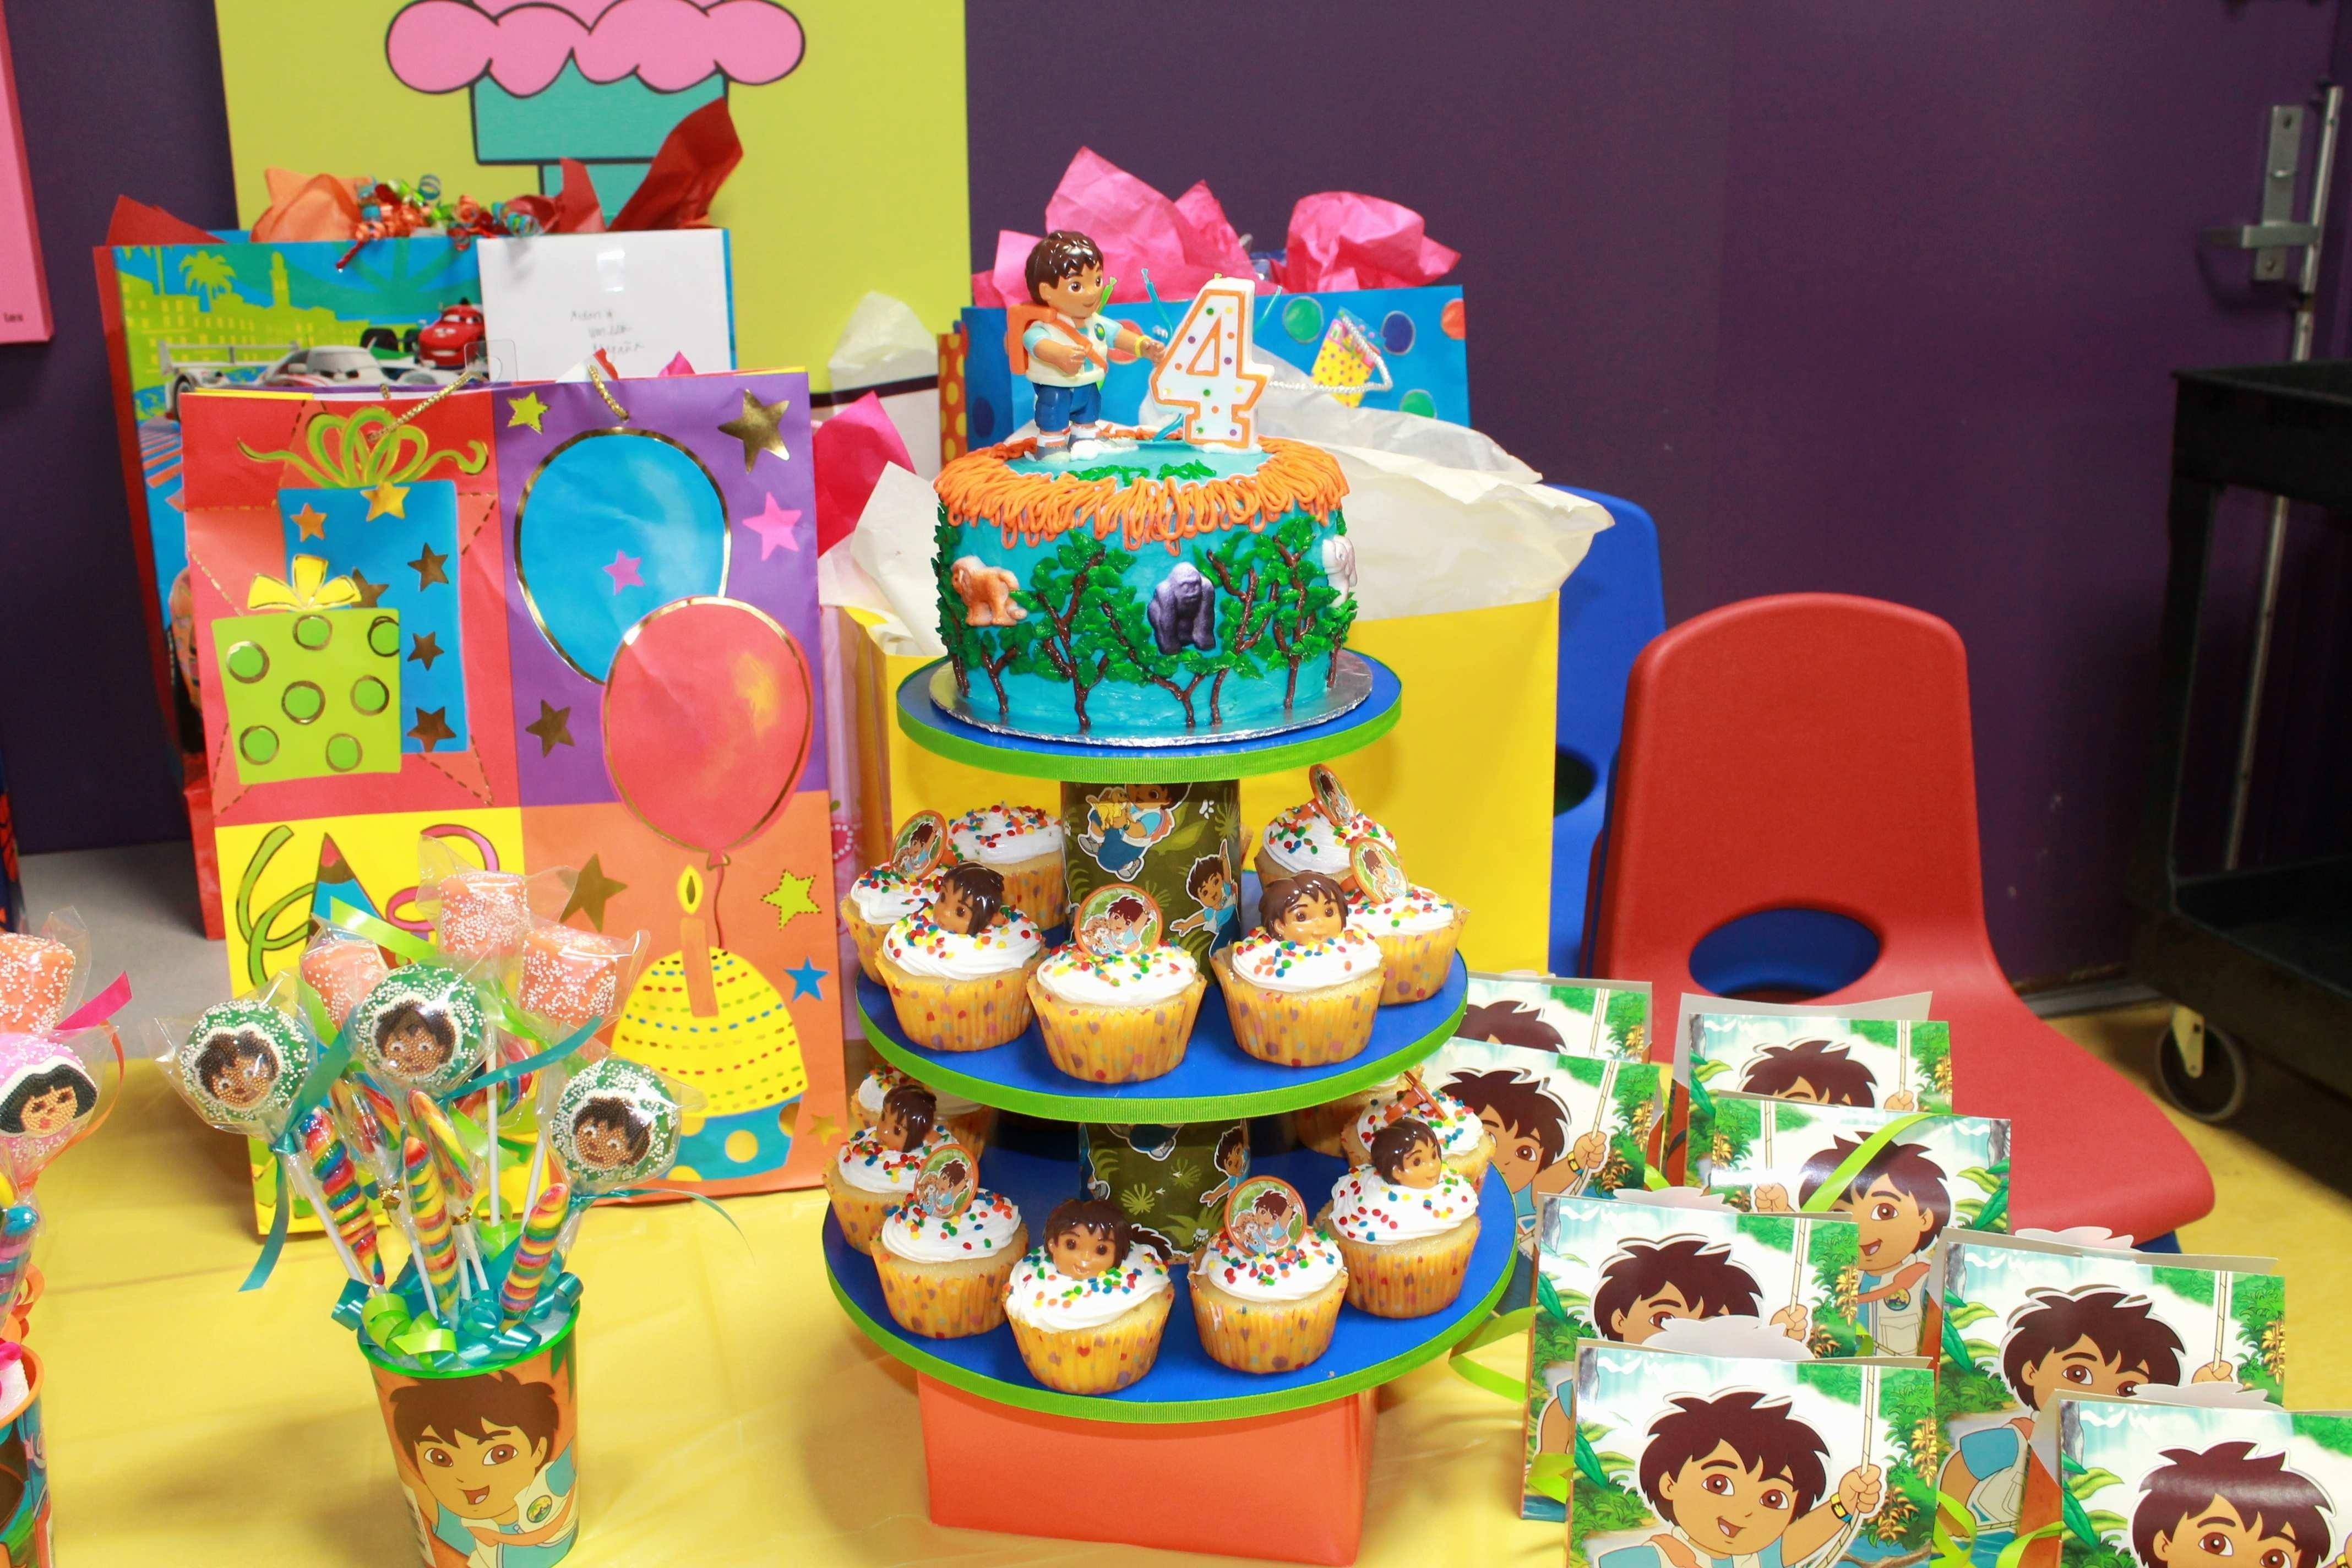 dora happy birthday images luxury dora and diego birthday party